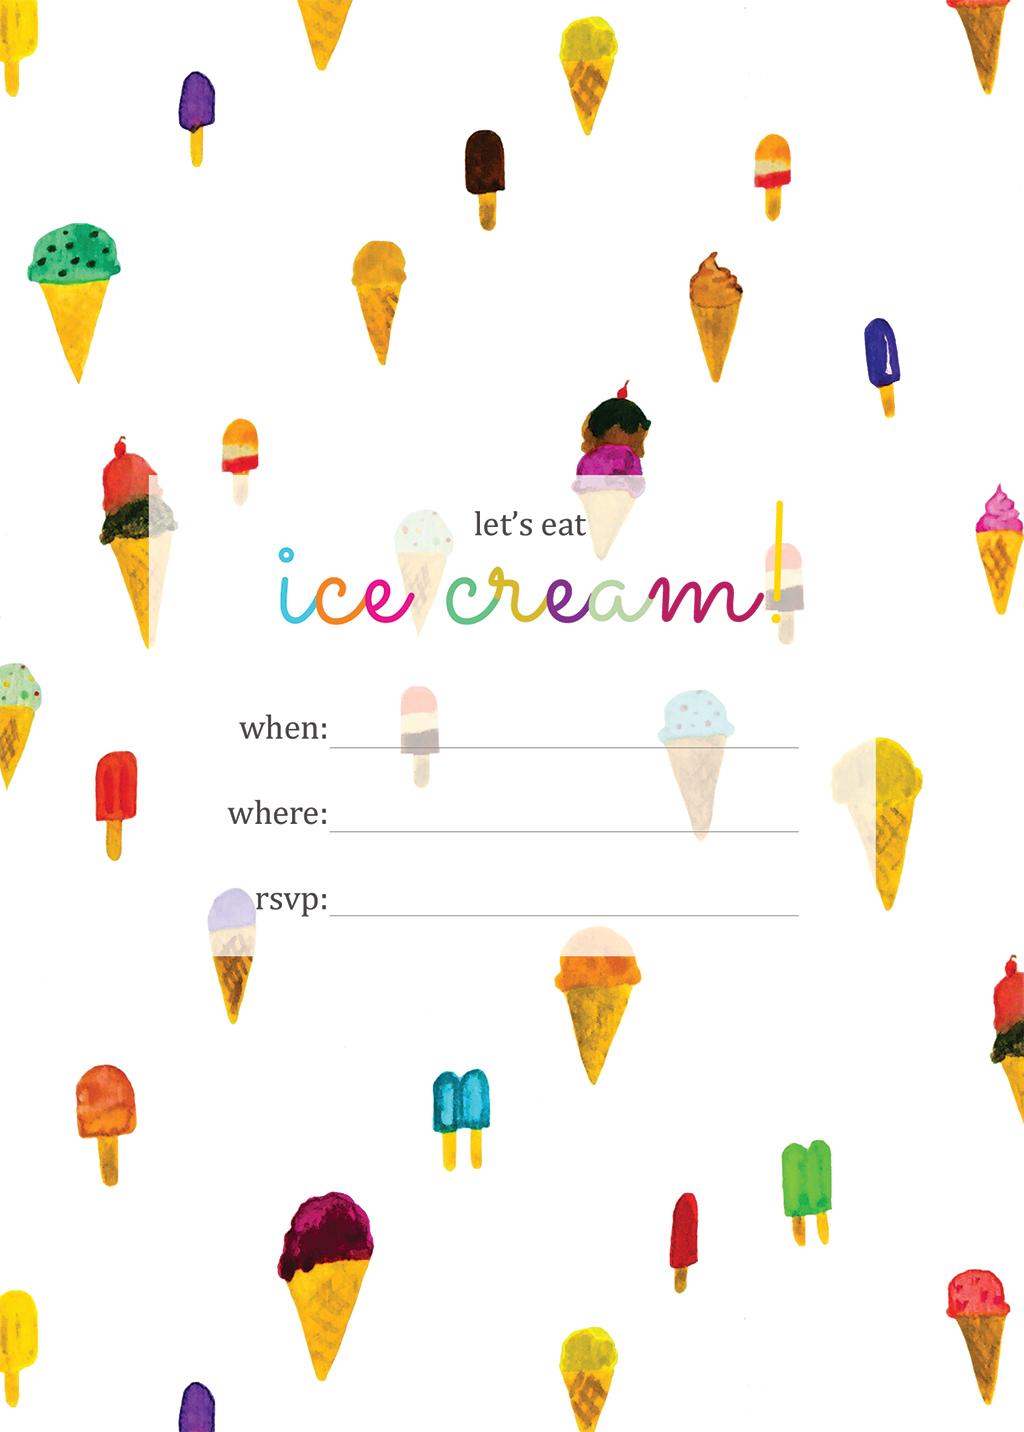 Print | Printable Ice Cream Party Invitation - Squirrelly Minds - Ice Cream Party Invitations Printable Free